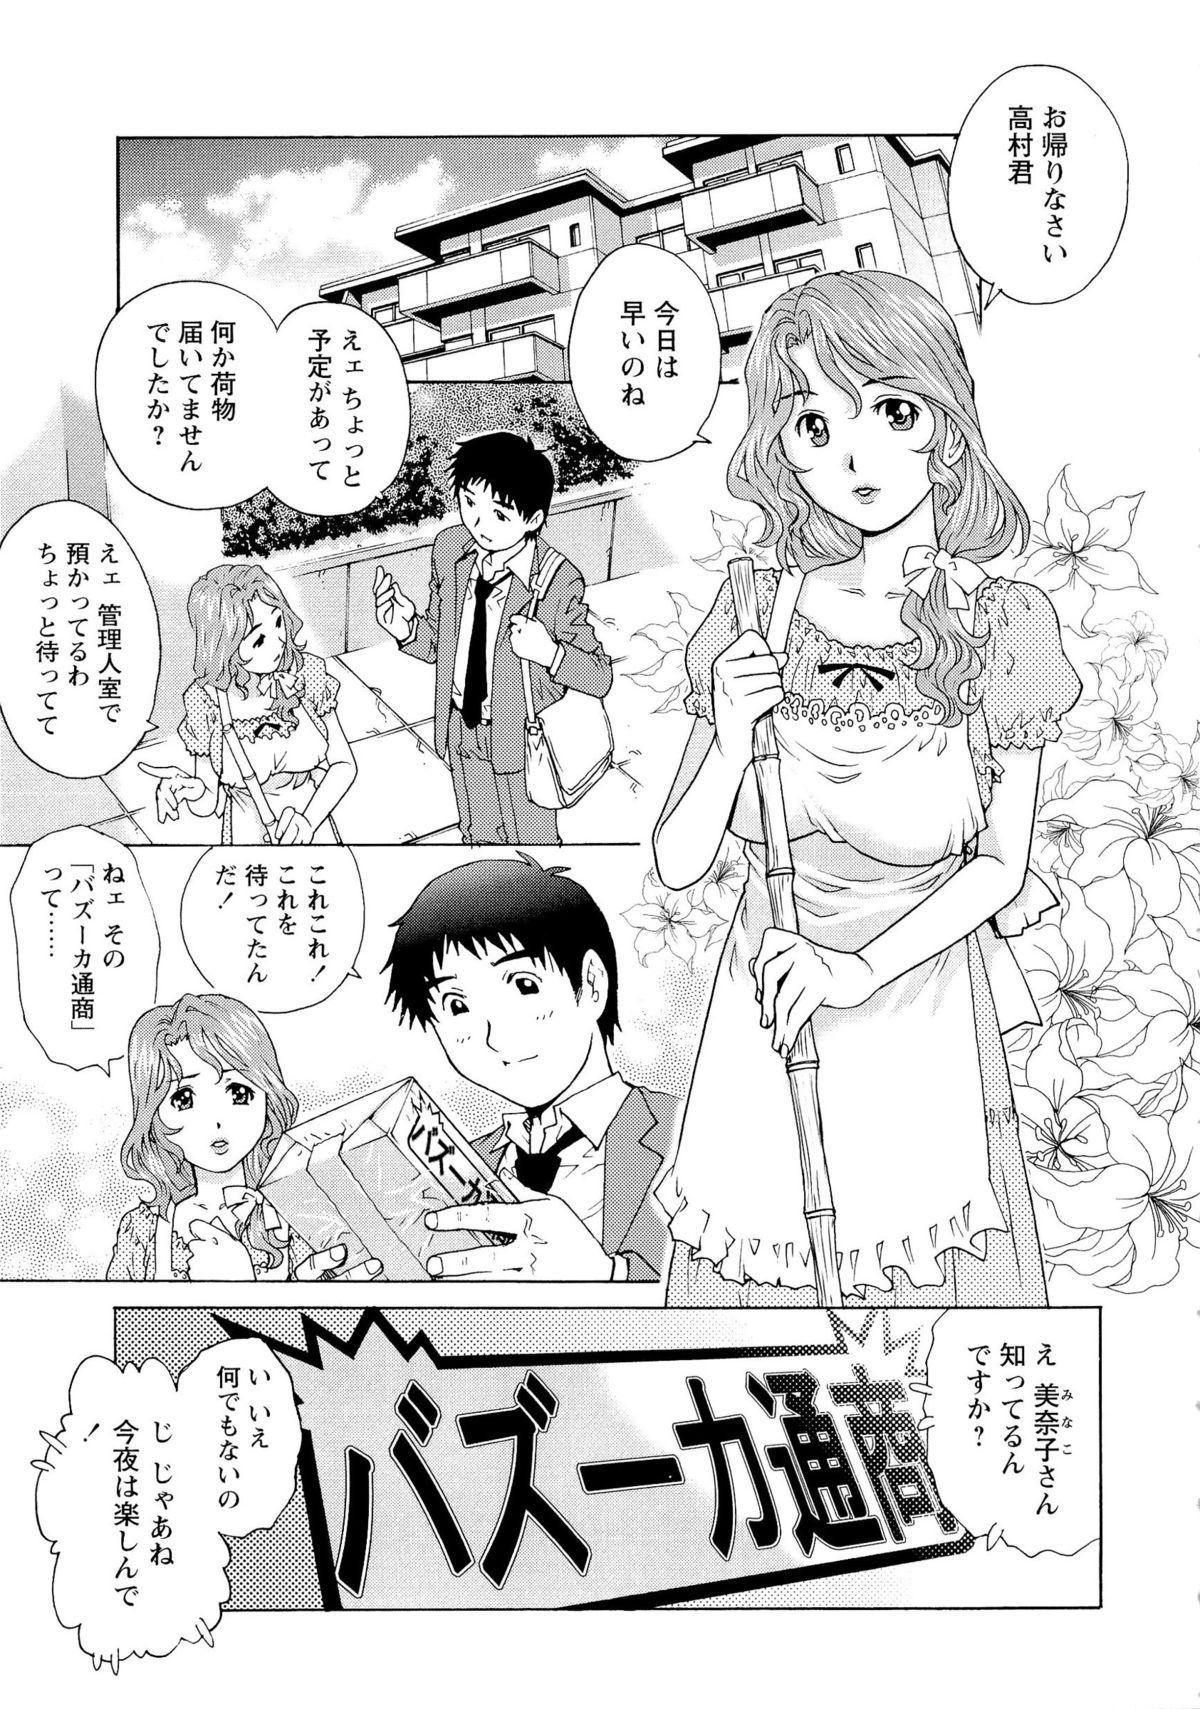 Nureteru Hitozuma - Wetly Wife 115